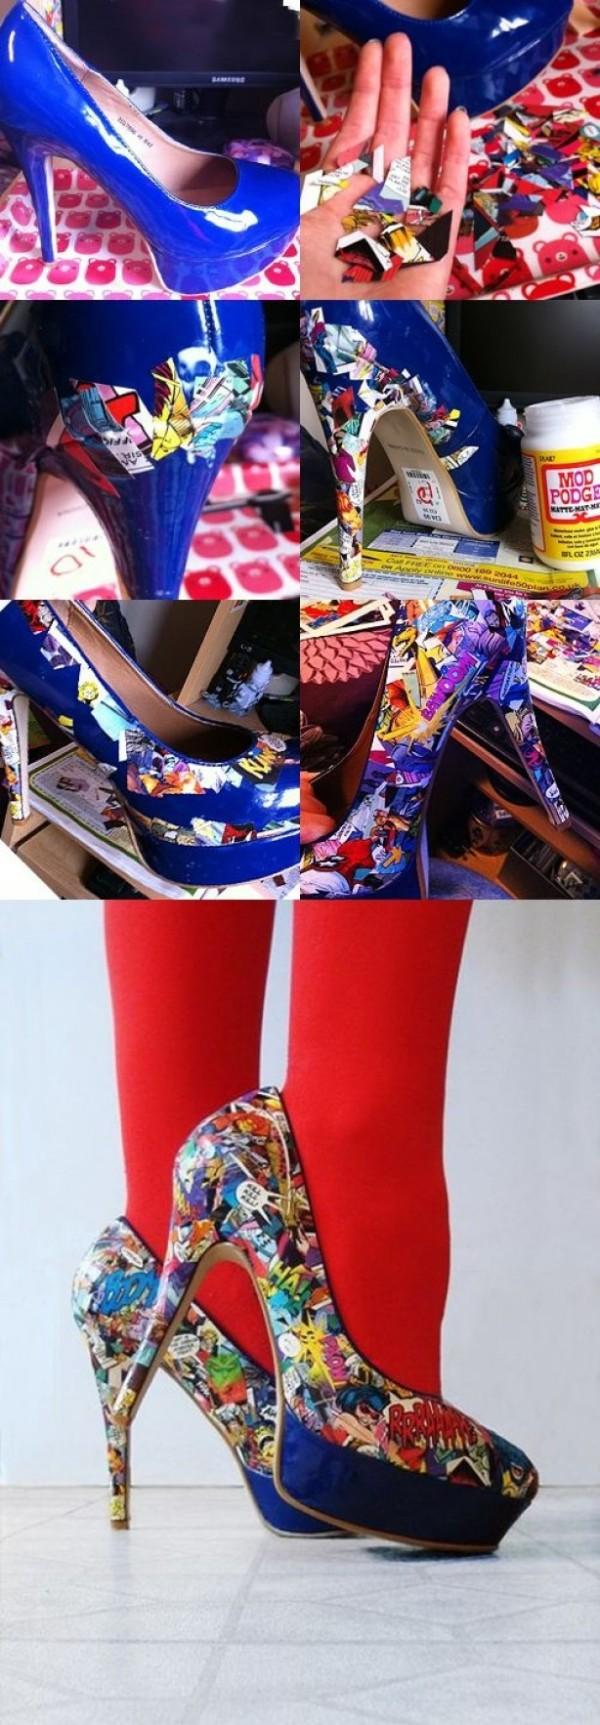 diy high heels makeover diy shoe makeover ideas2